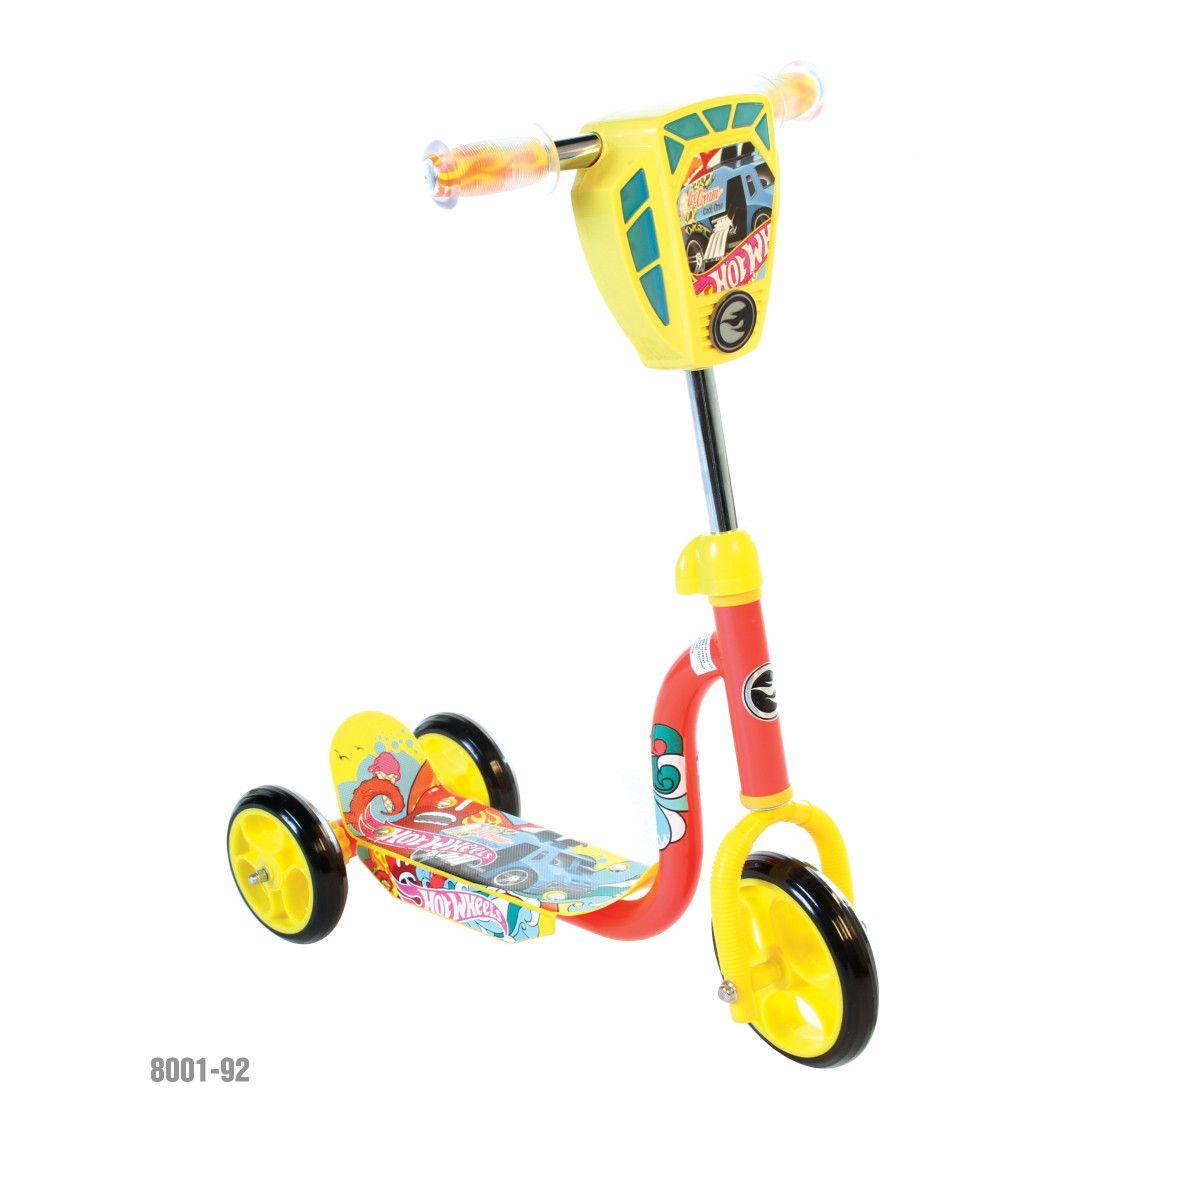 6 hot wheels 3wheeled scooter w ls hot wheels